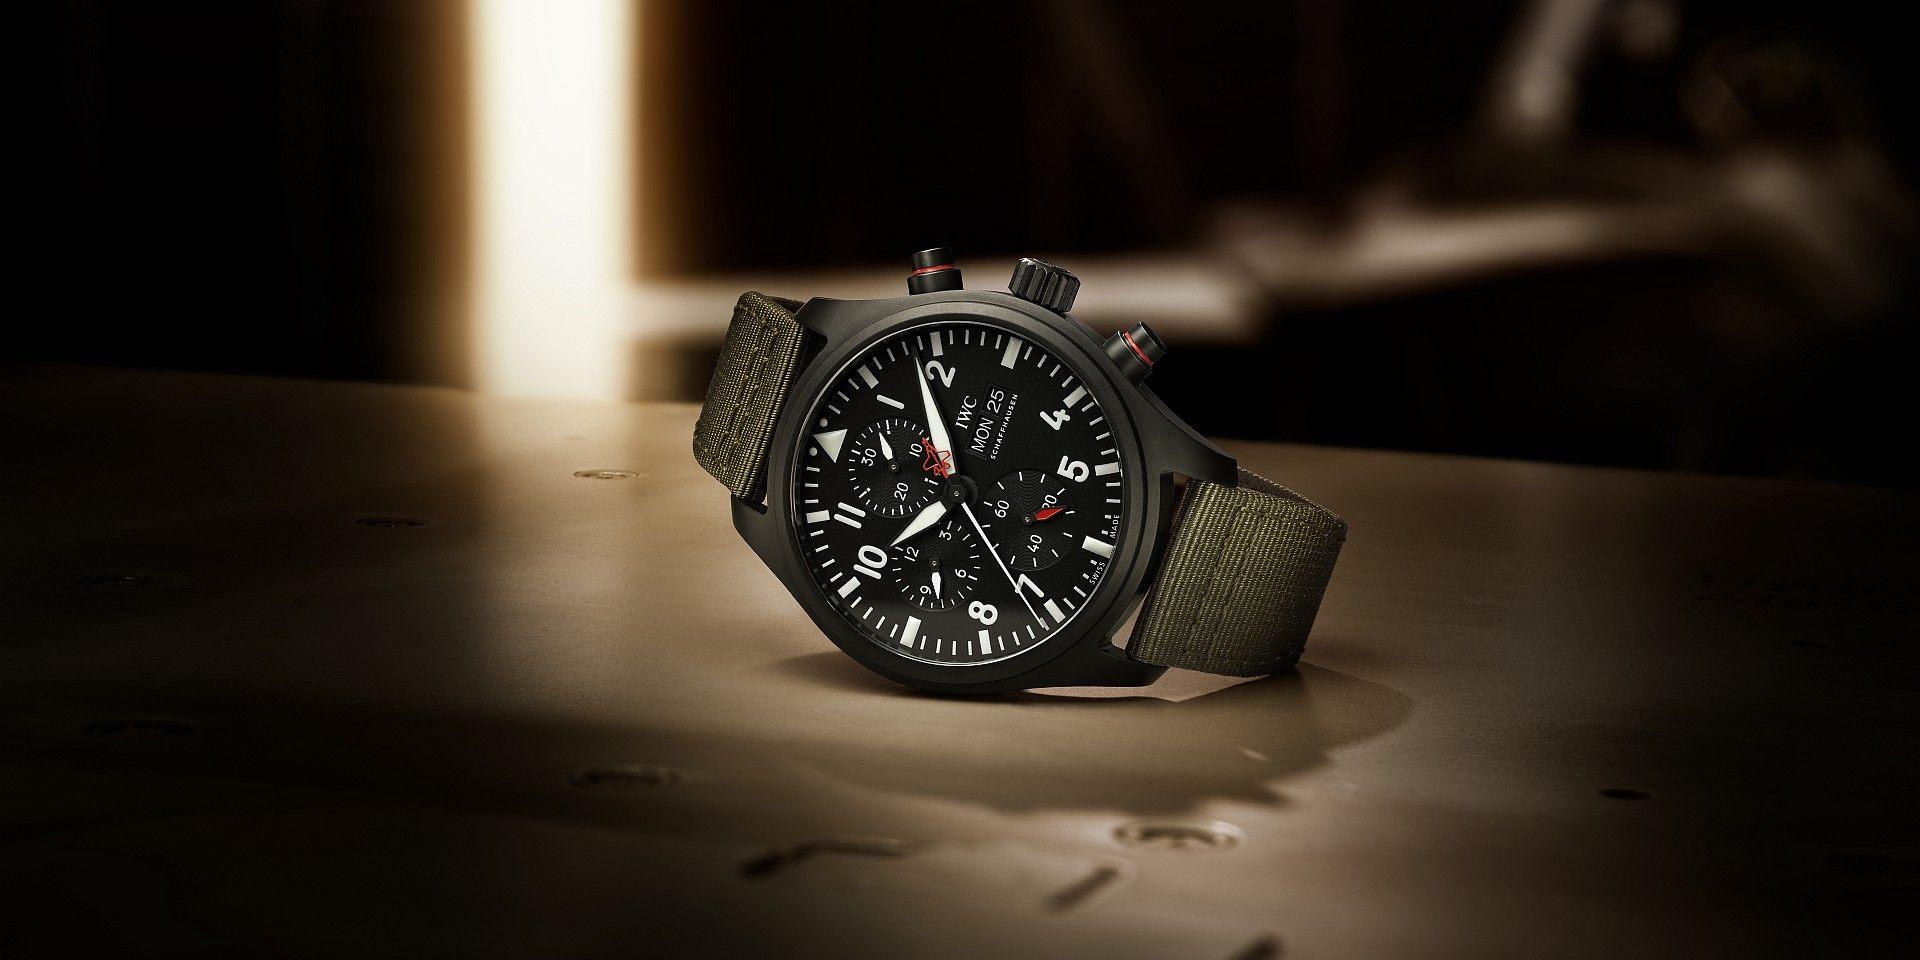 IWC推出黑色陶瓷及瓷化鈦金屬打造的飛行員系列TOP GUN海軍空戰部隊計時腕錶「SFTI」特別版